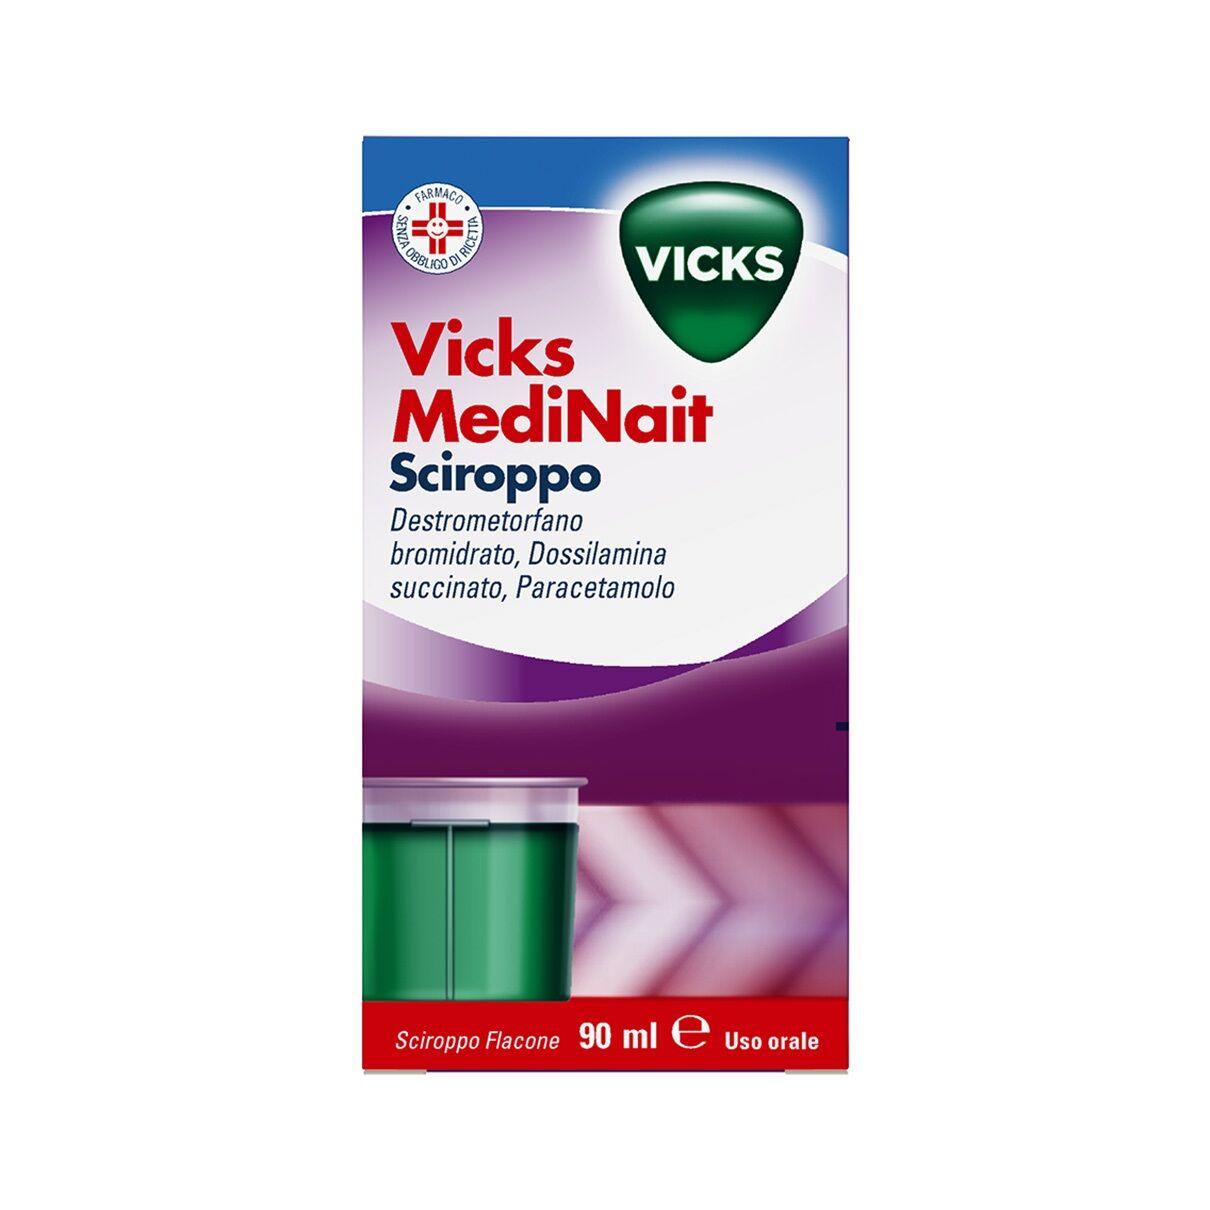 Procter & Gamble Vicks MediNait Sciroppo (90 ml)